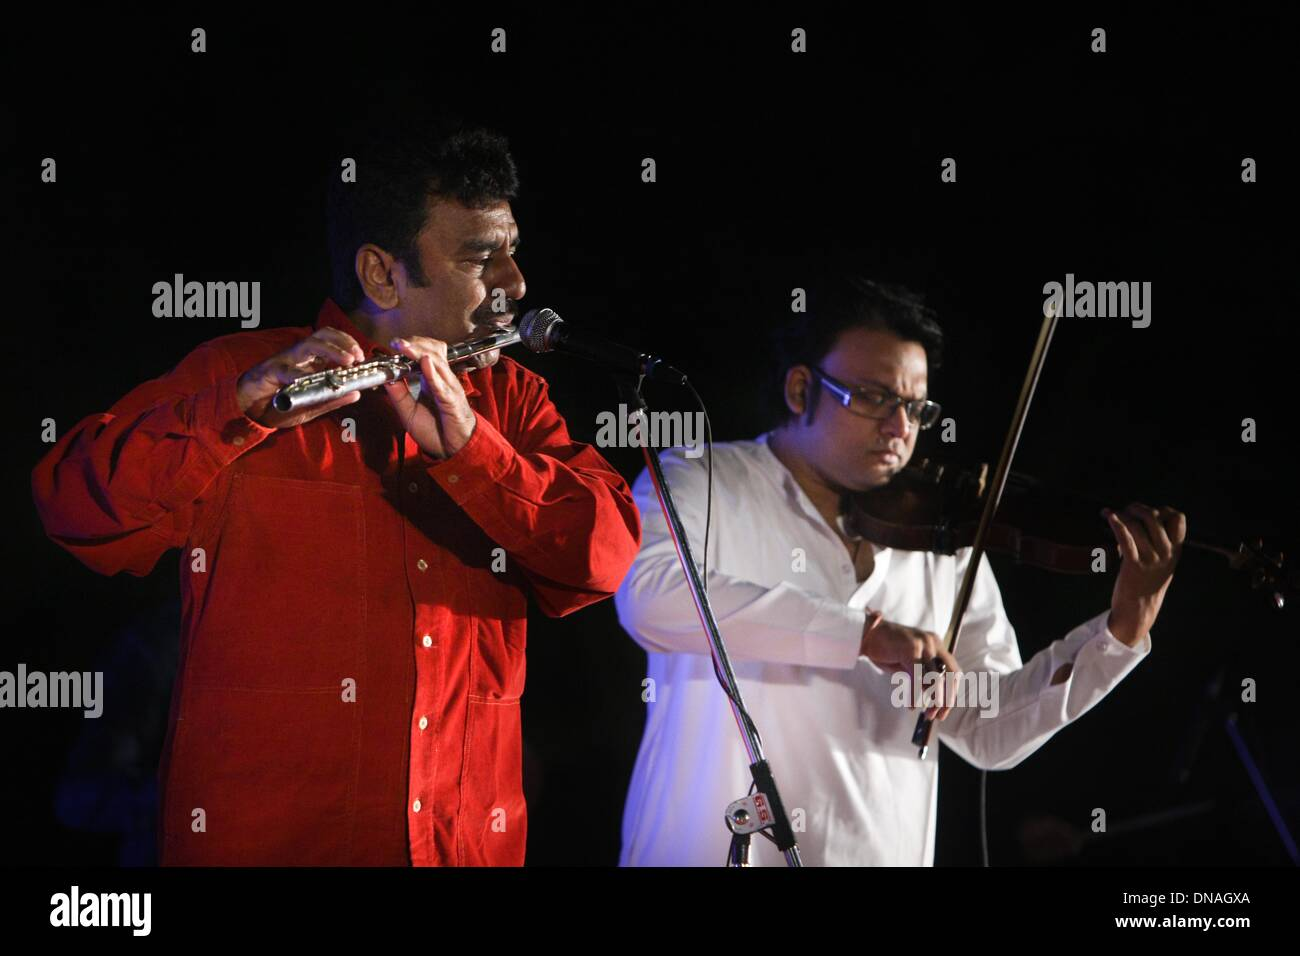 Pune  21st Dec, 2013  Indian flute musician Sunneel Varma (L